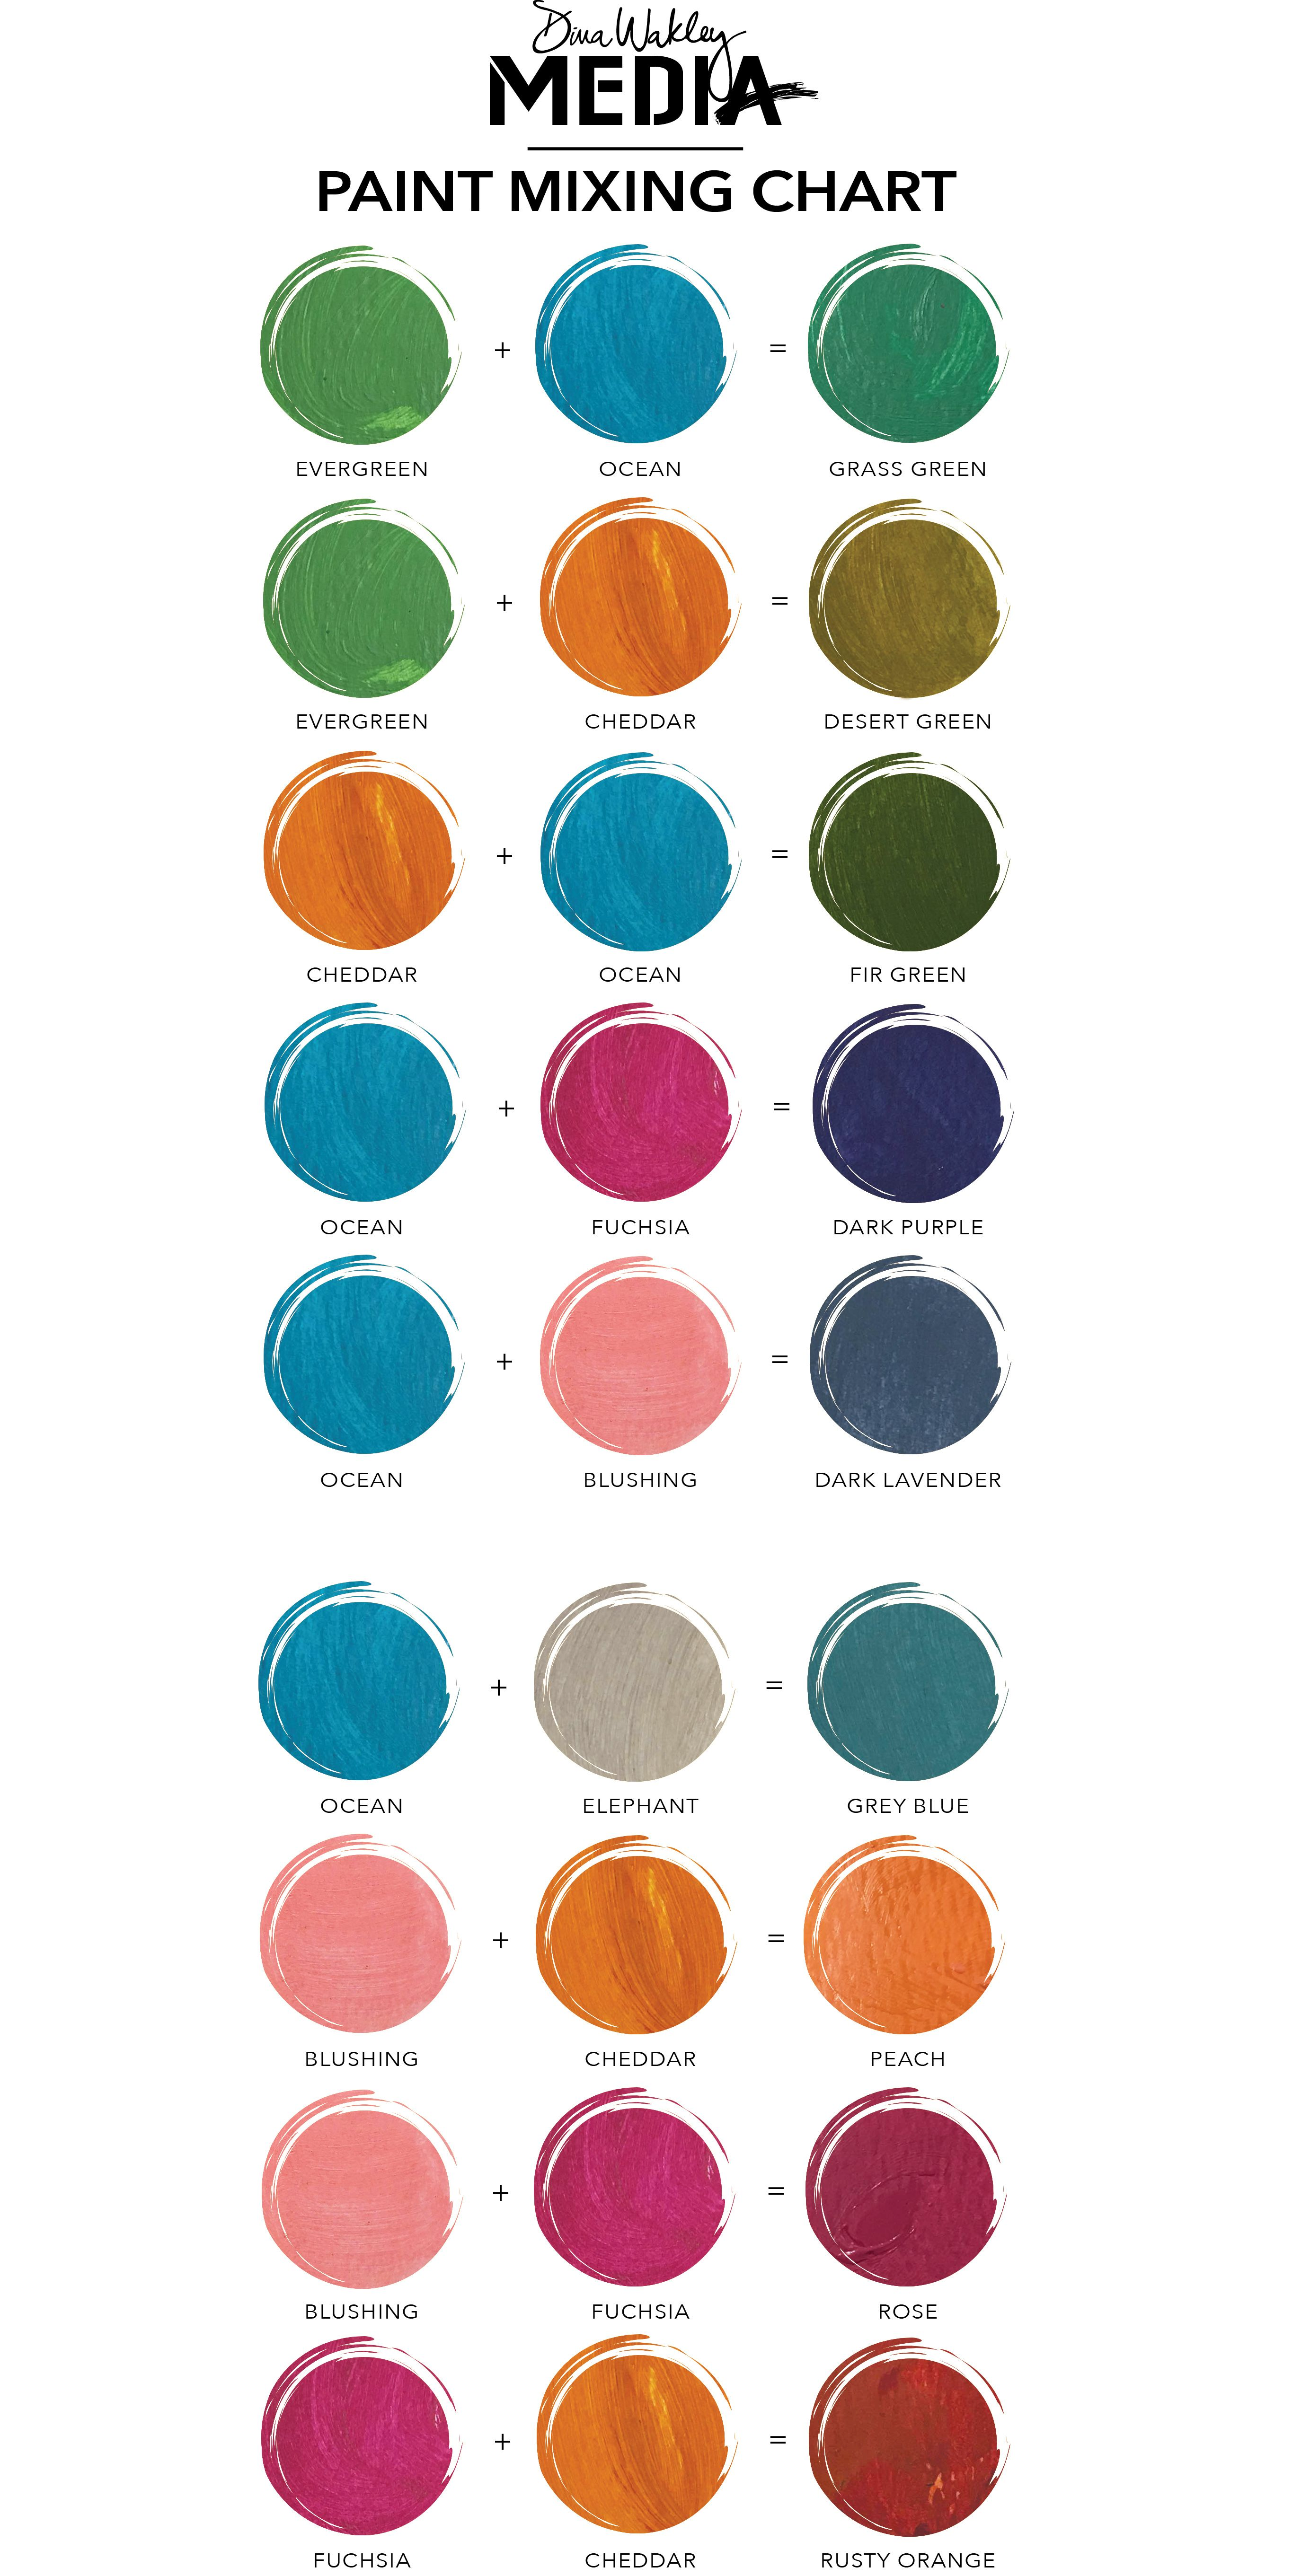 New Dina Wakley Media Paint Color Mixing Chart